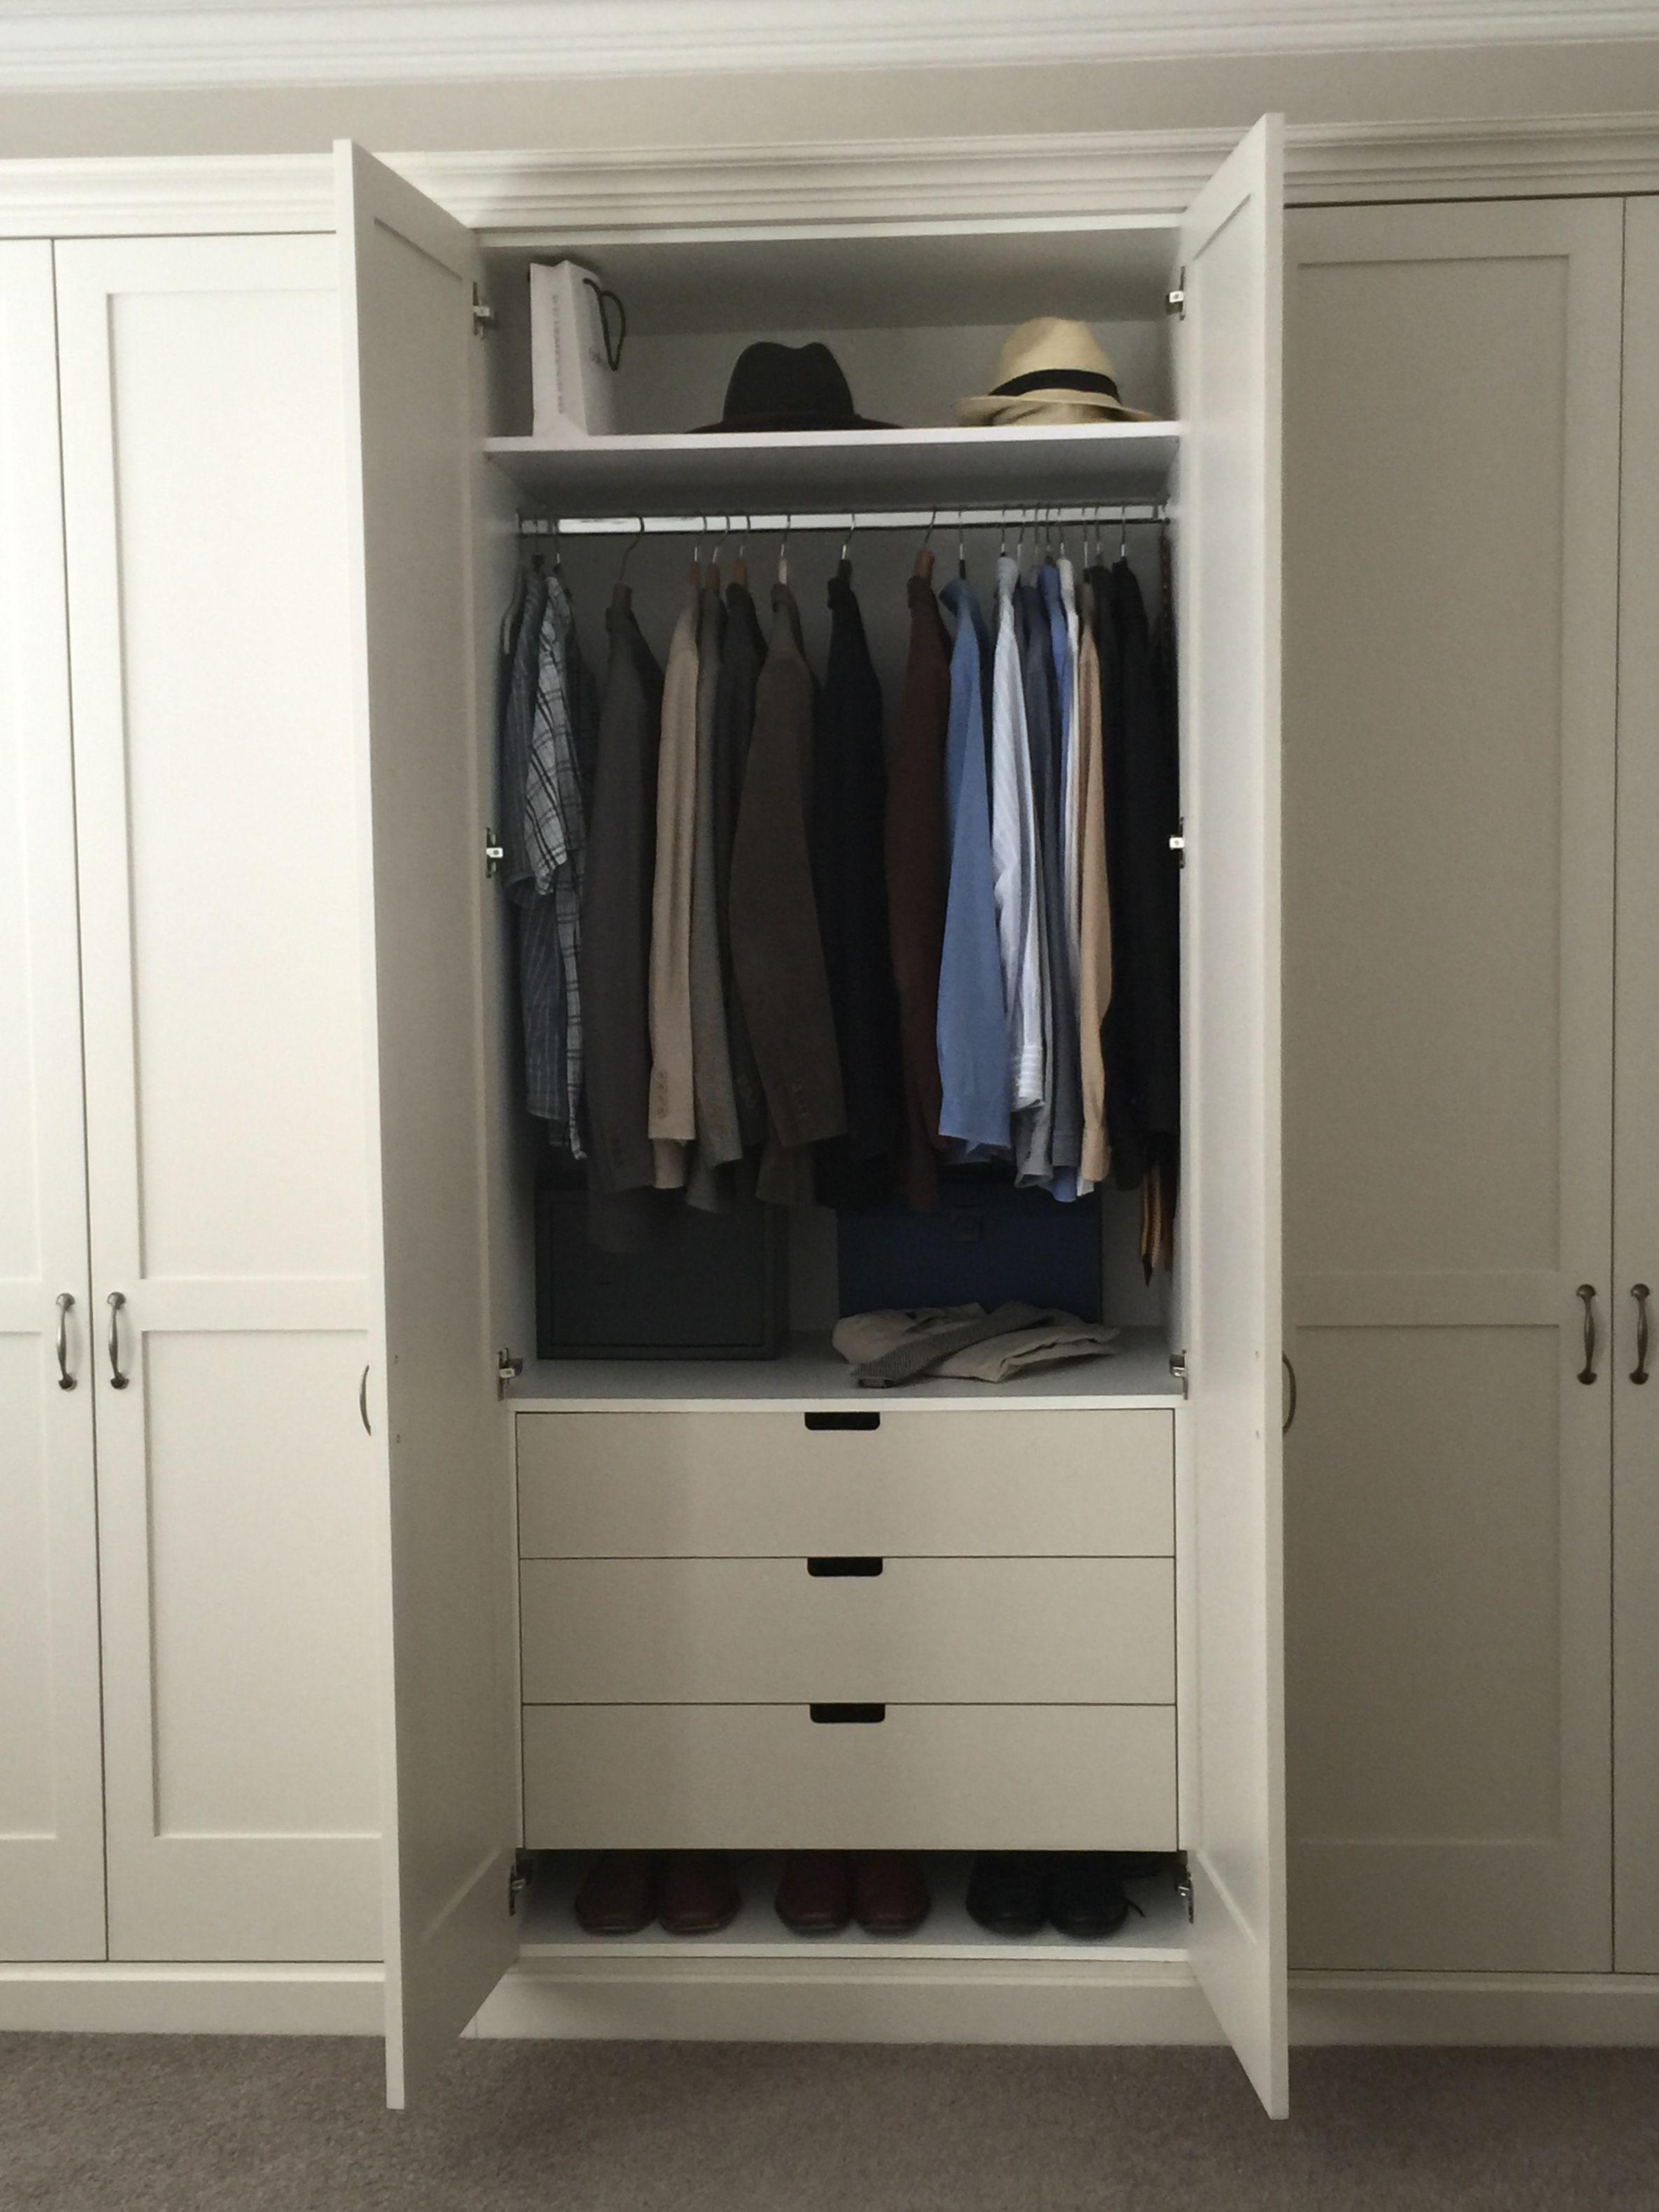 Traditional Shaker Wardrobes With Drawers Inside Shelves Wardrobe Drawers Bedroom Furniture Design Wardrobe Closet Storage